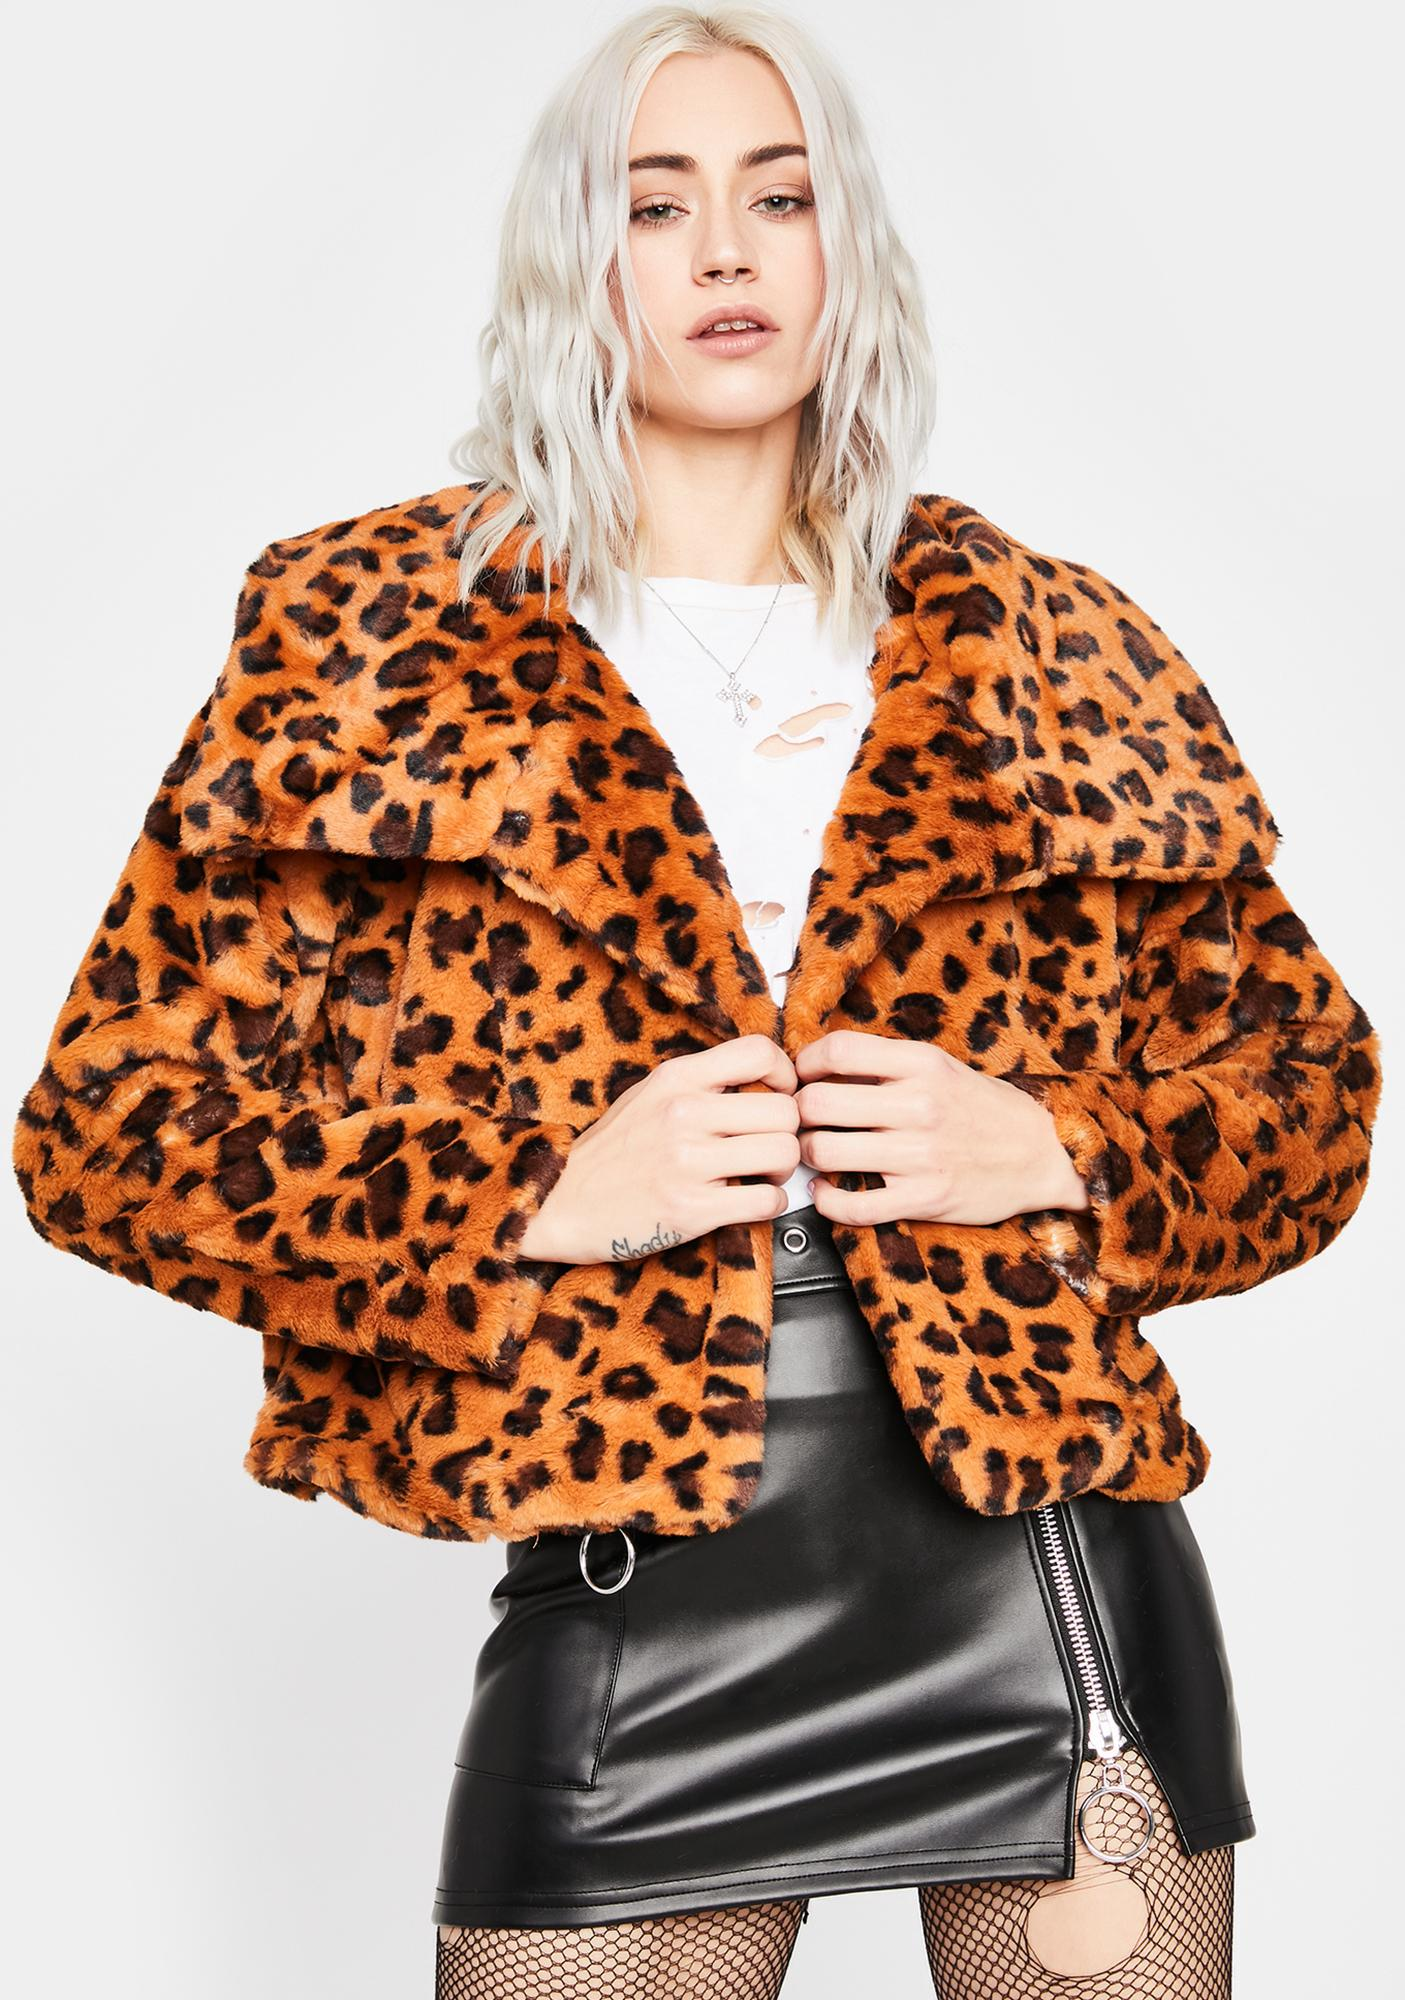 Pounce Back Faux Fur Jacket